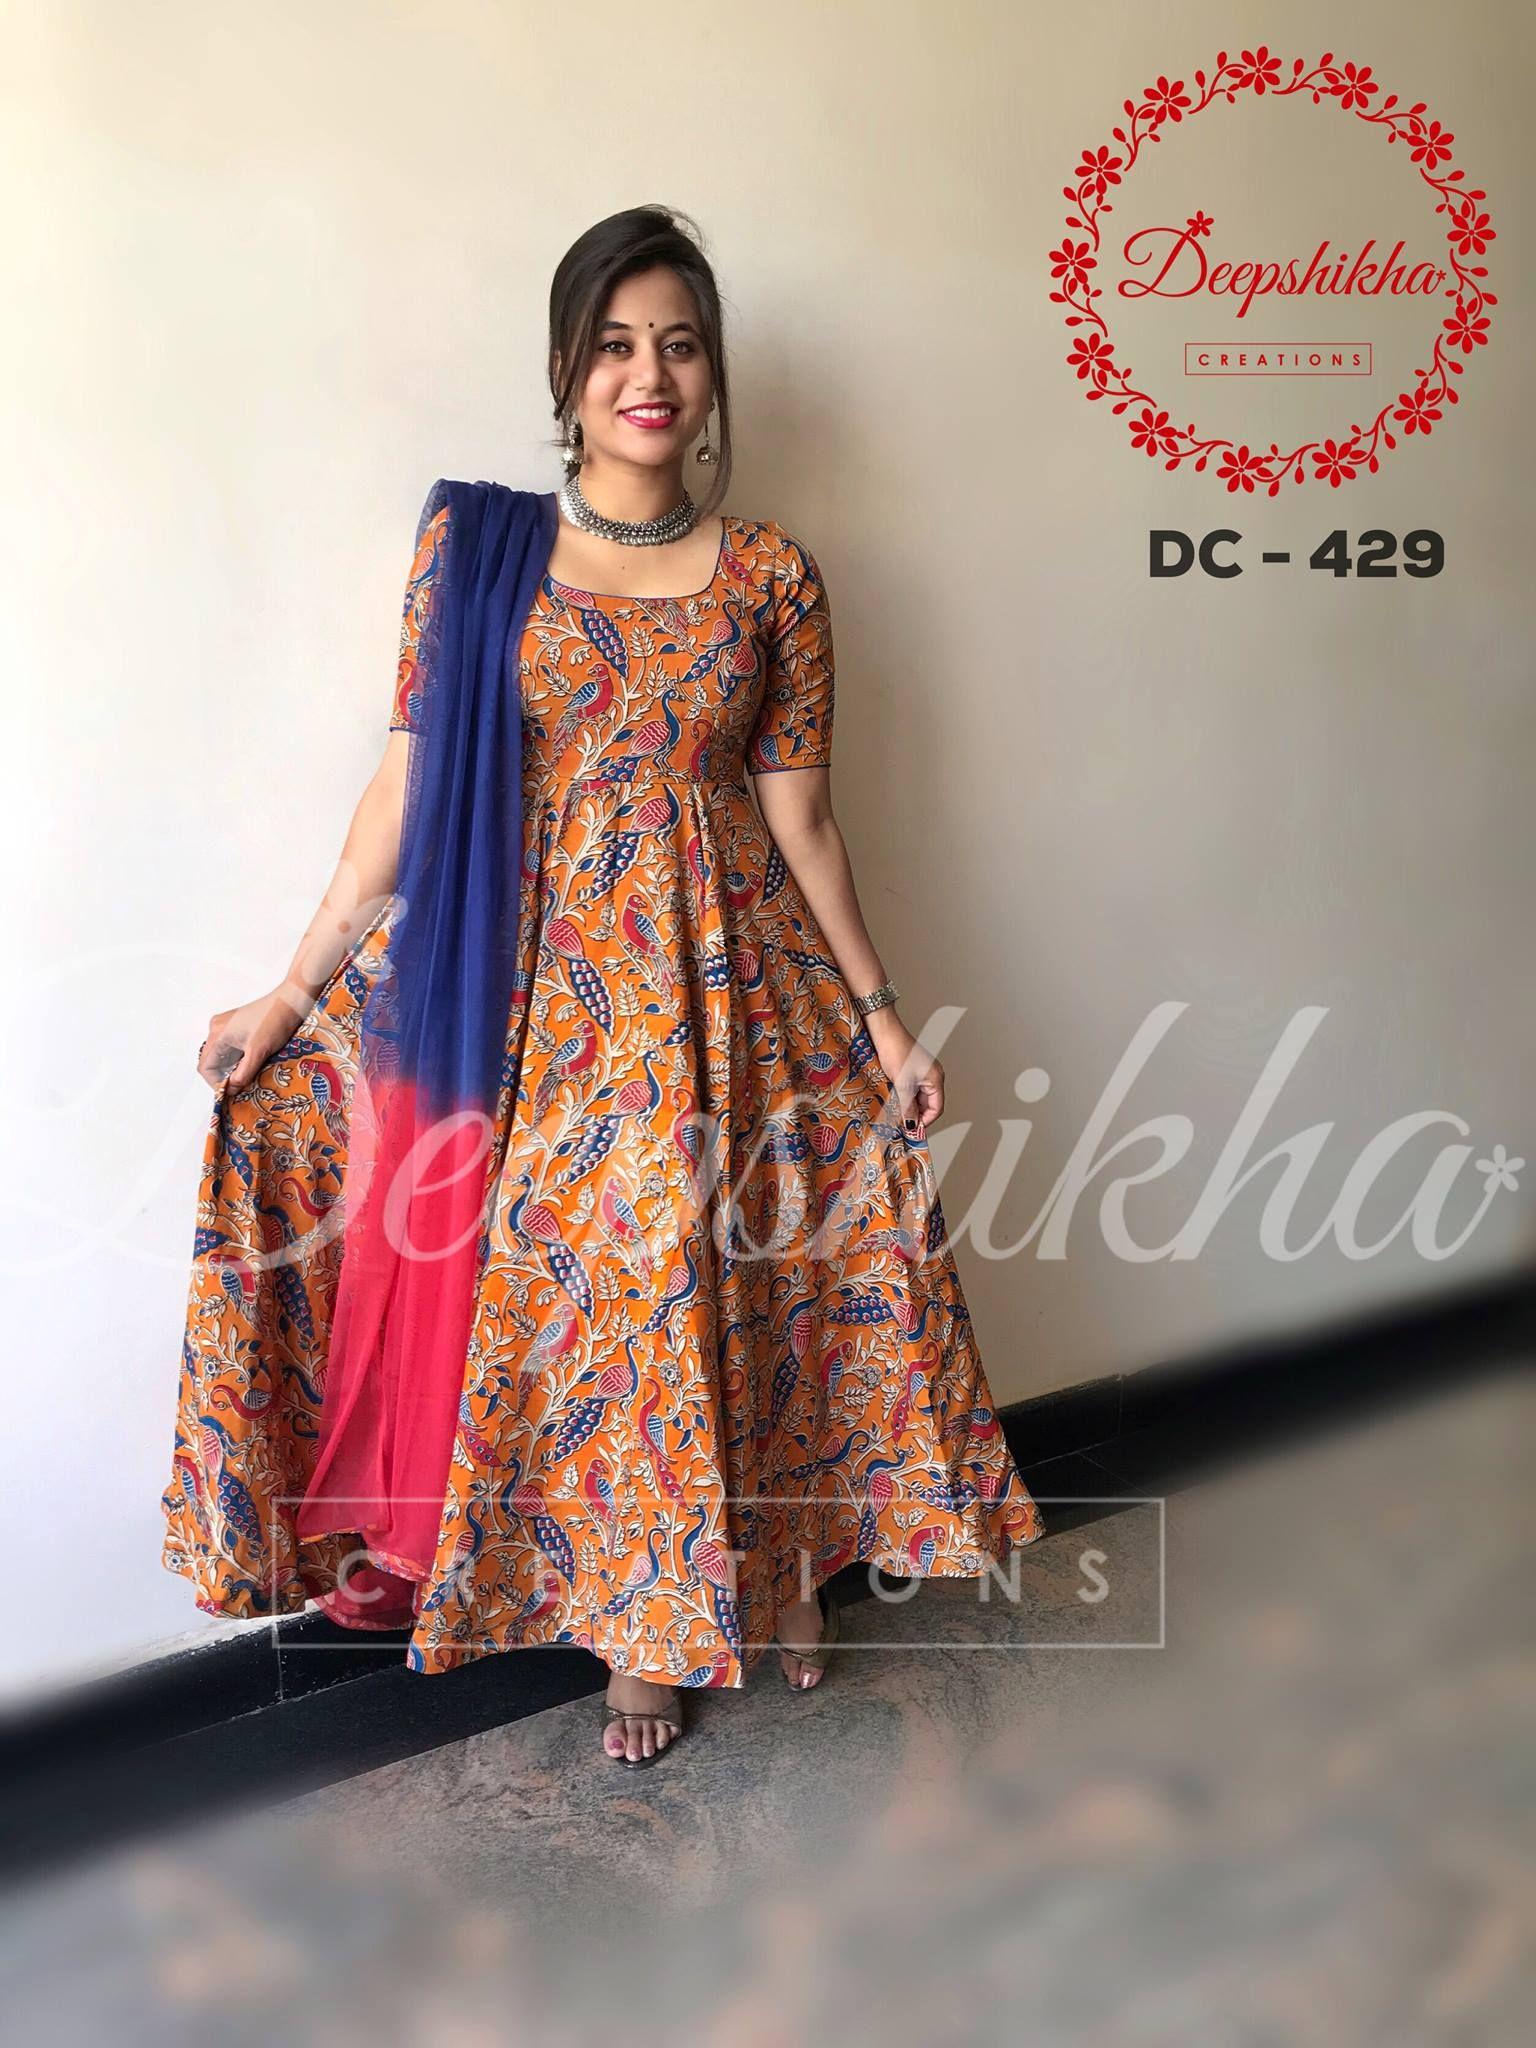 4539273e4950e DC 429. Beautiful floor length anarkali dress from Deepshikha Creations.  For queries kindly WhatsApp   +91 9059683293